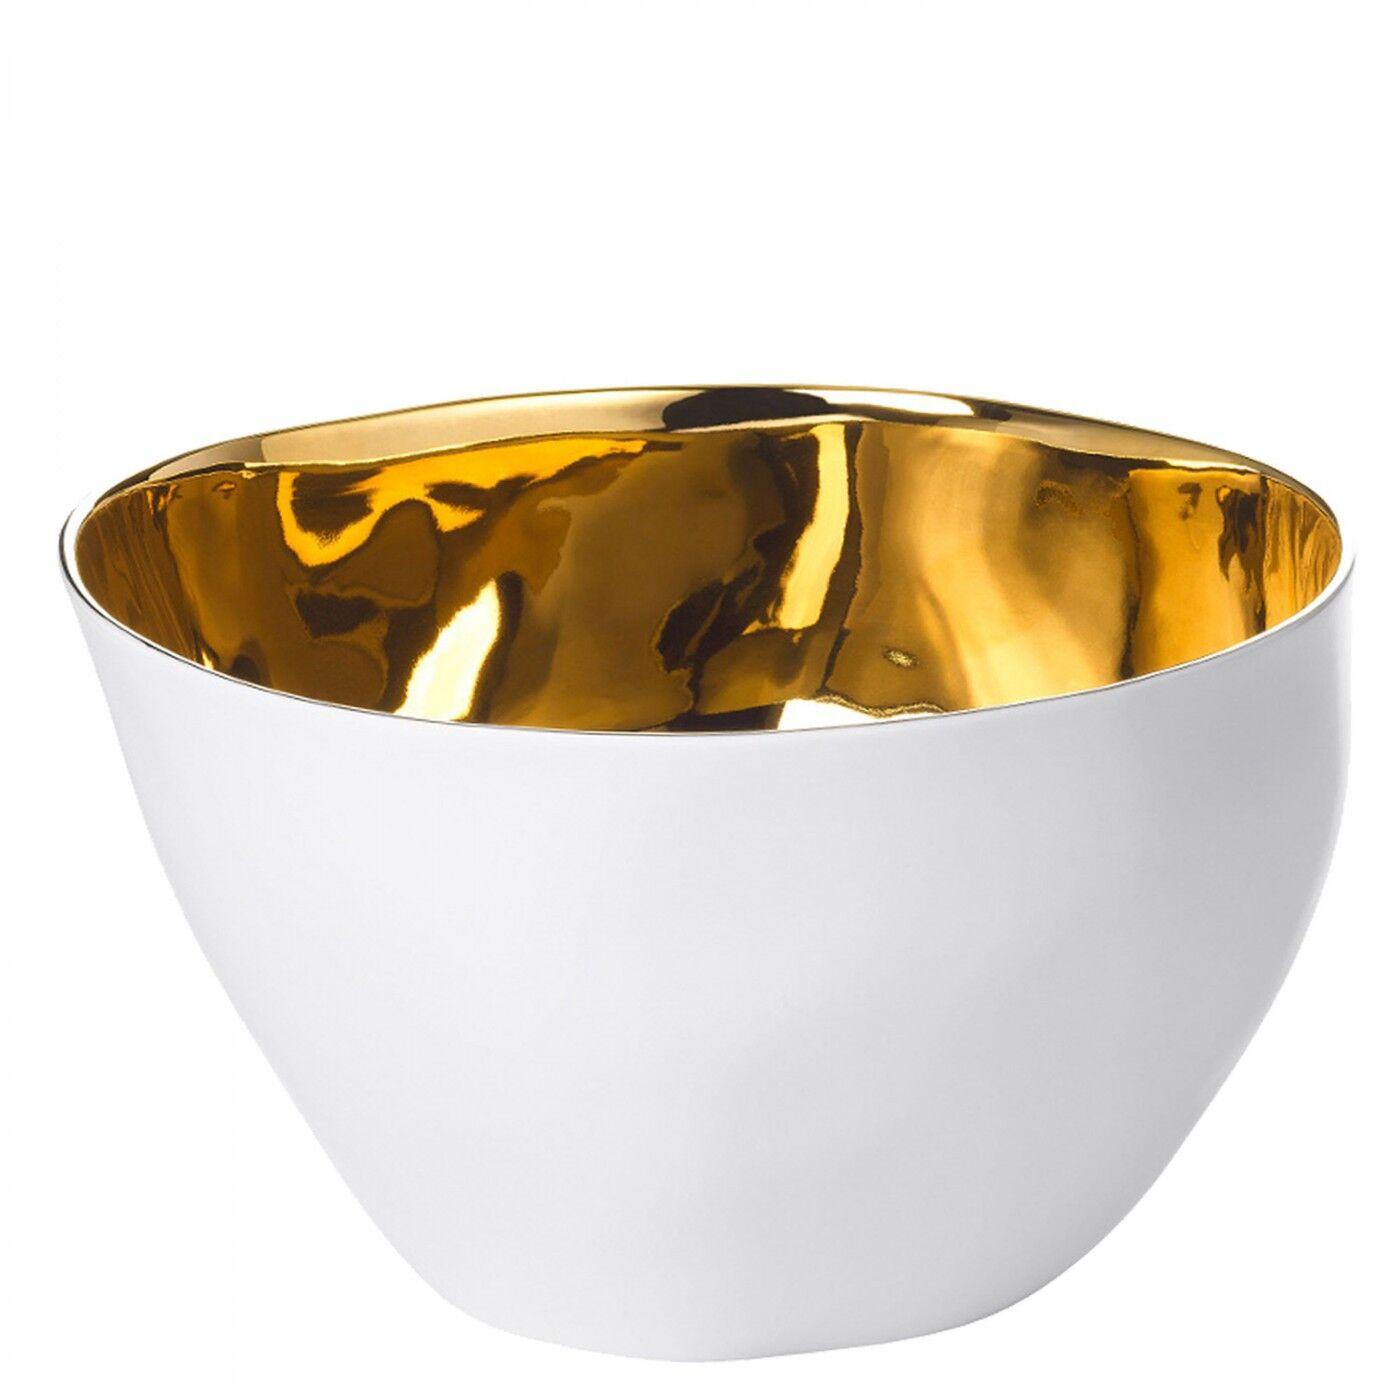 Tsé & Tsé Associées Grand Bol Affamé Porcelaine Blanc Brillant et Or Diam 16 cm Tsé & Tsé